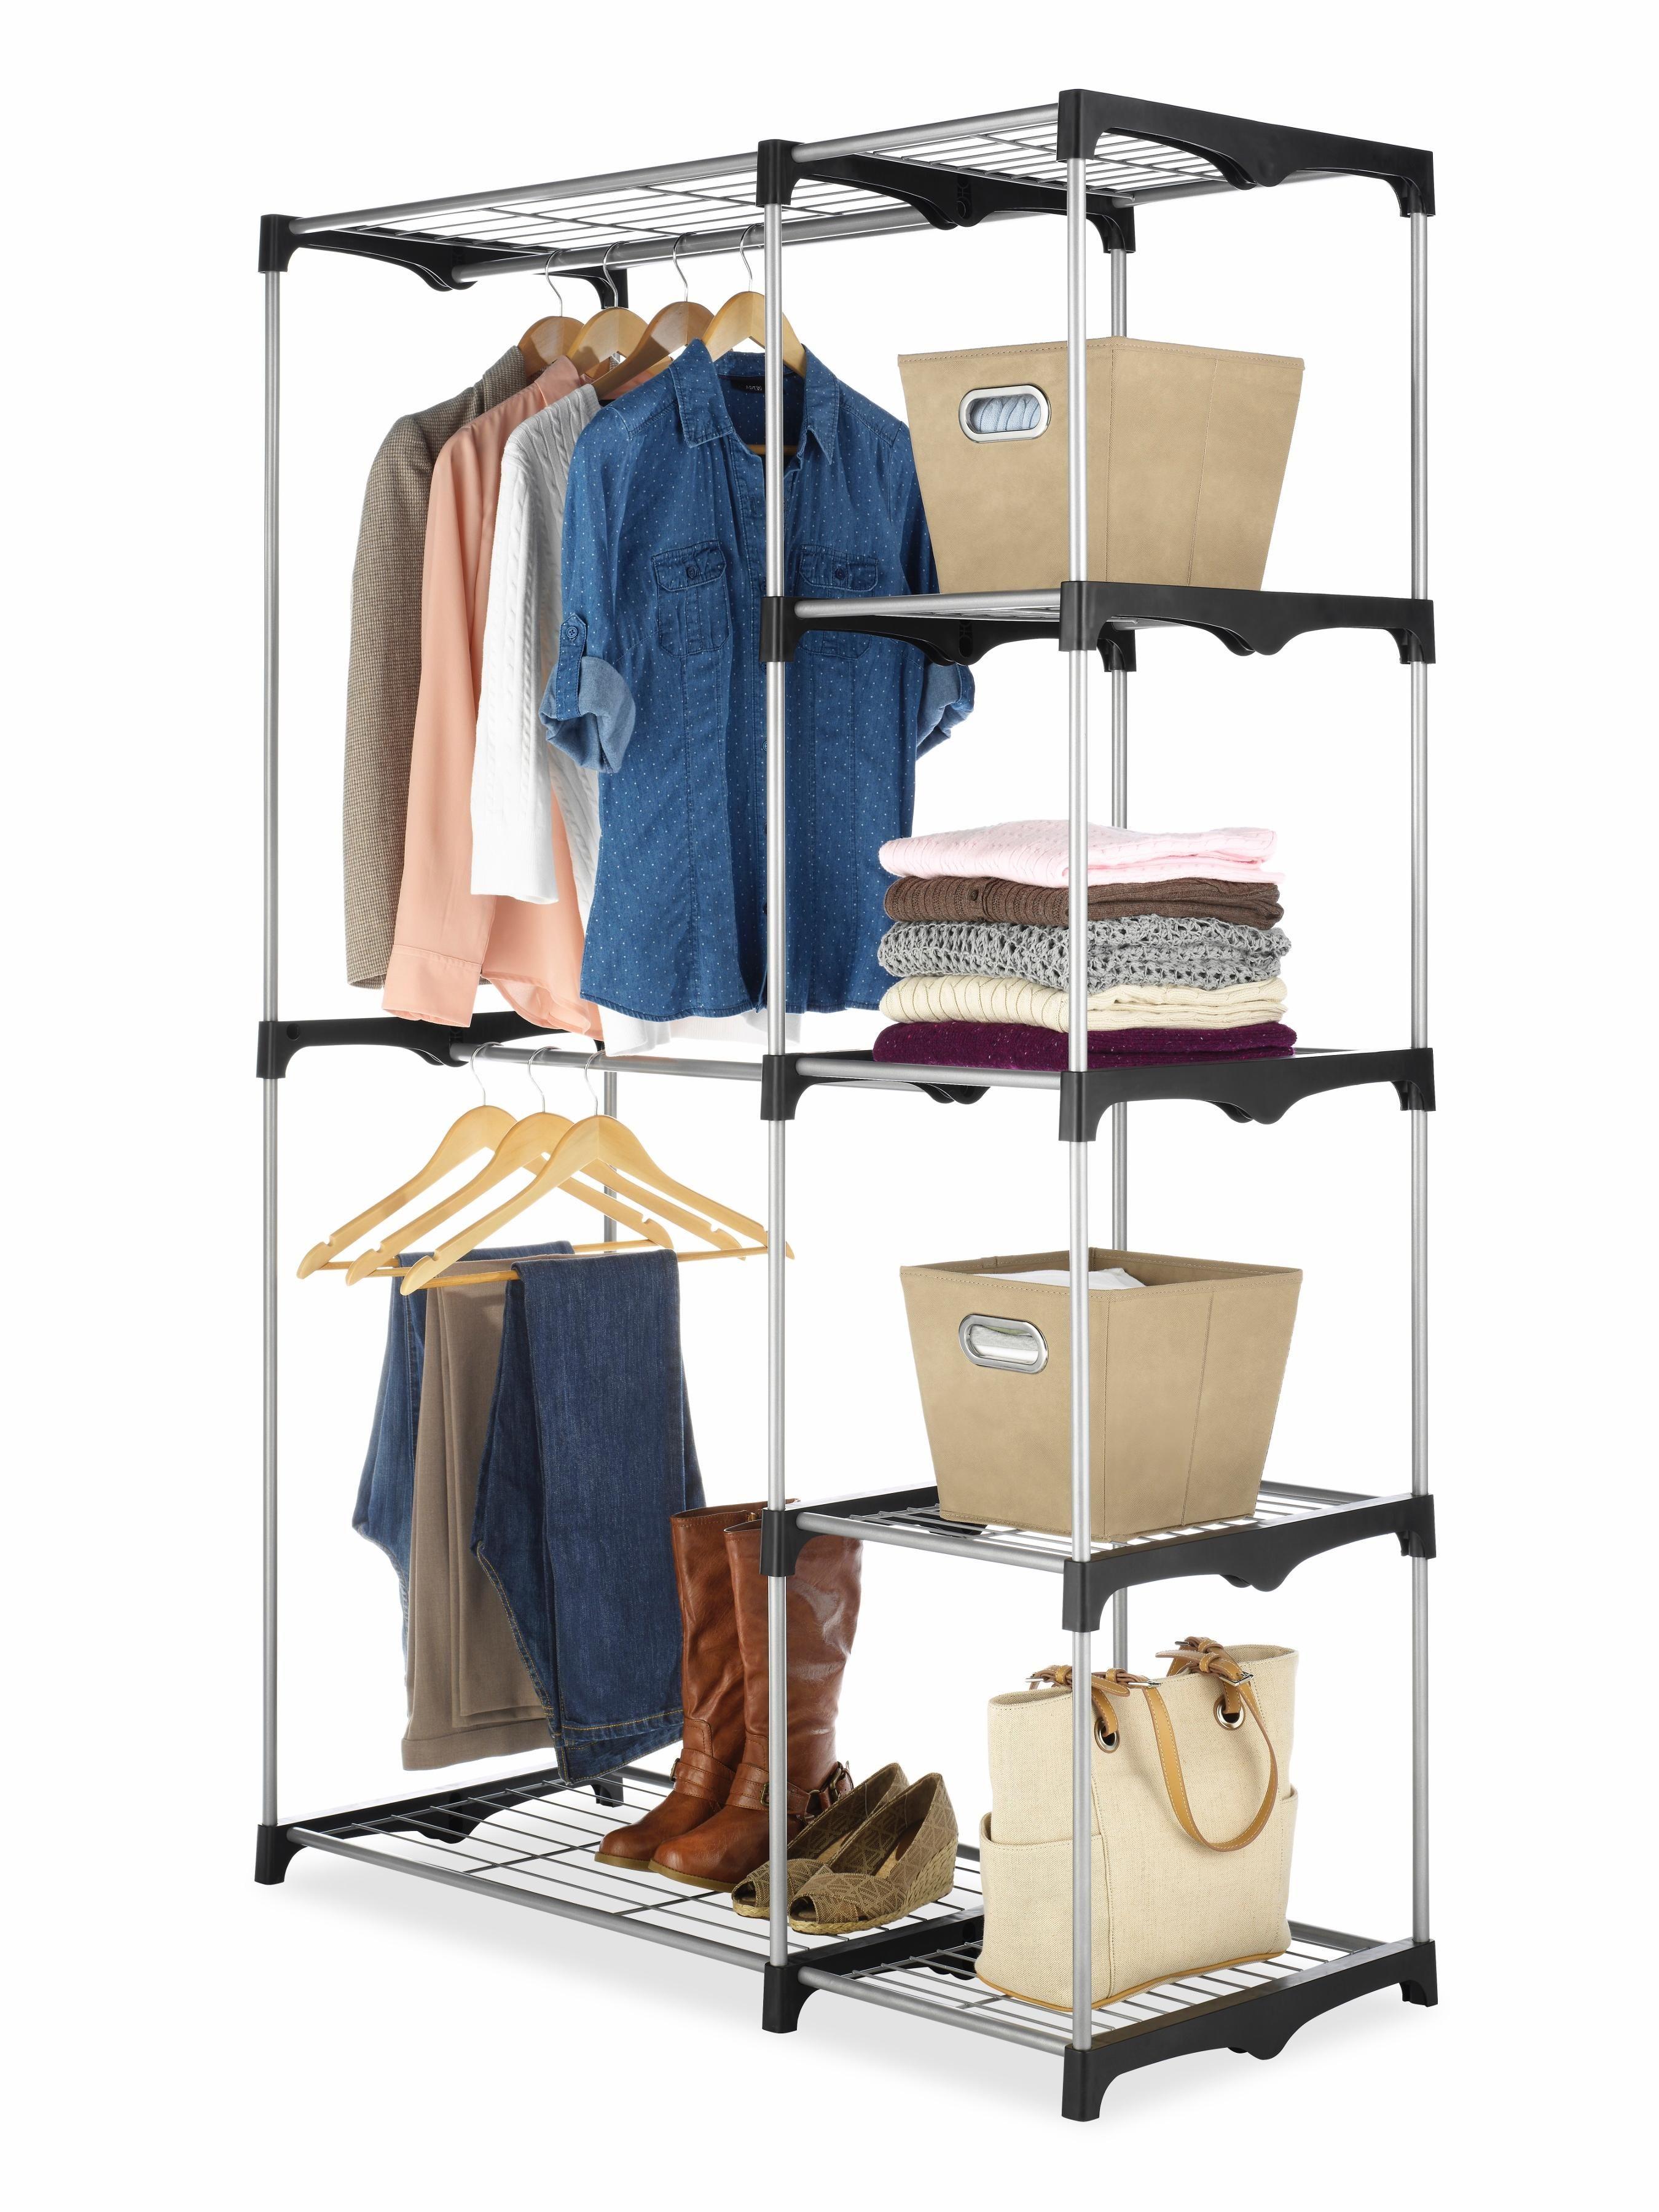 48 46amazon Com Whitmor 6779 3044 Double Rod Closet Silver Closet Storage And Organiza Wire Closet Shelving Closet Shelf Organization Free Standing Closet